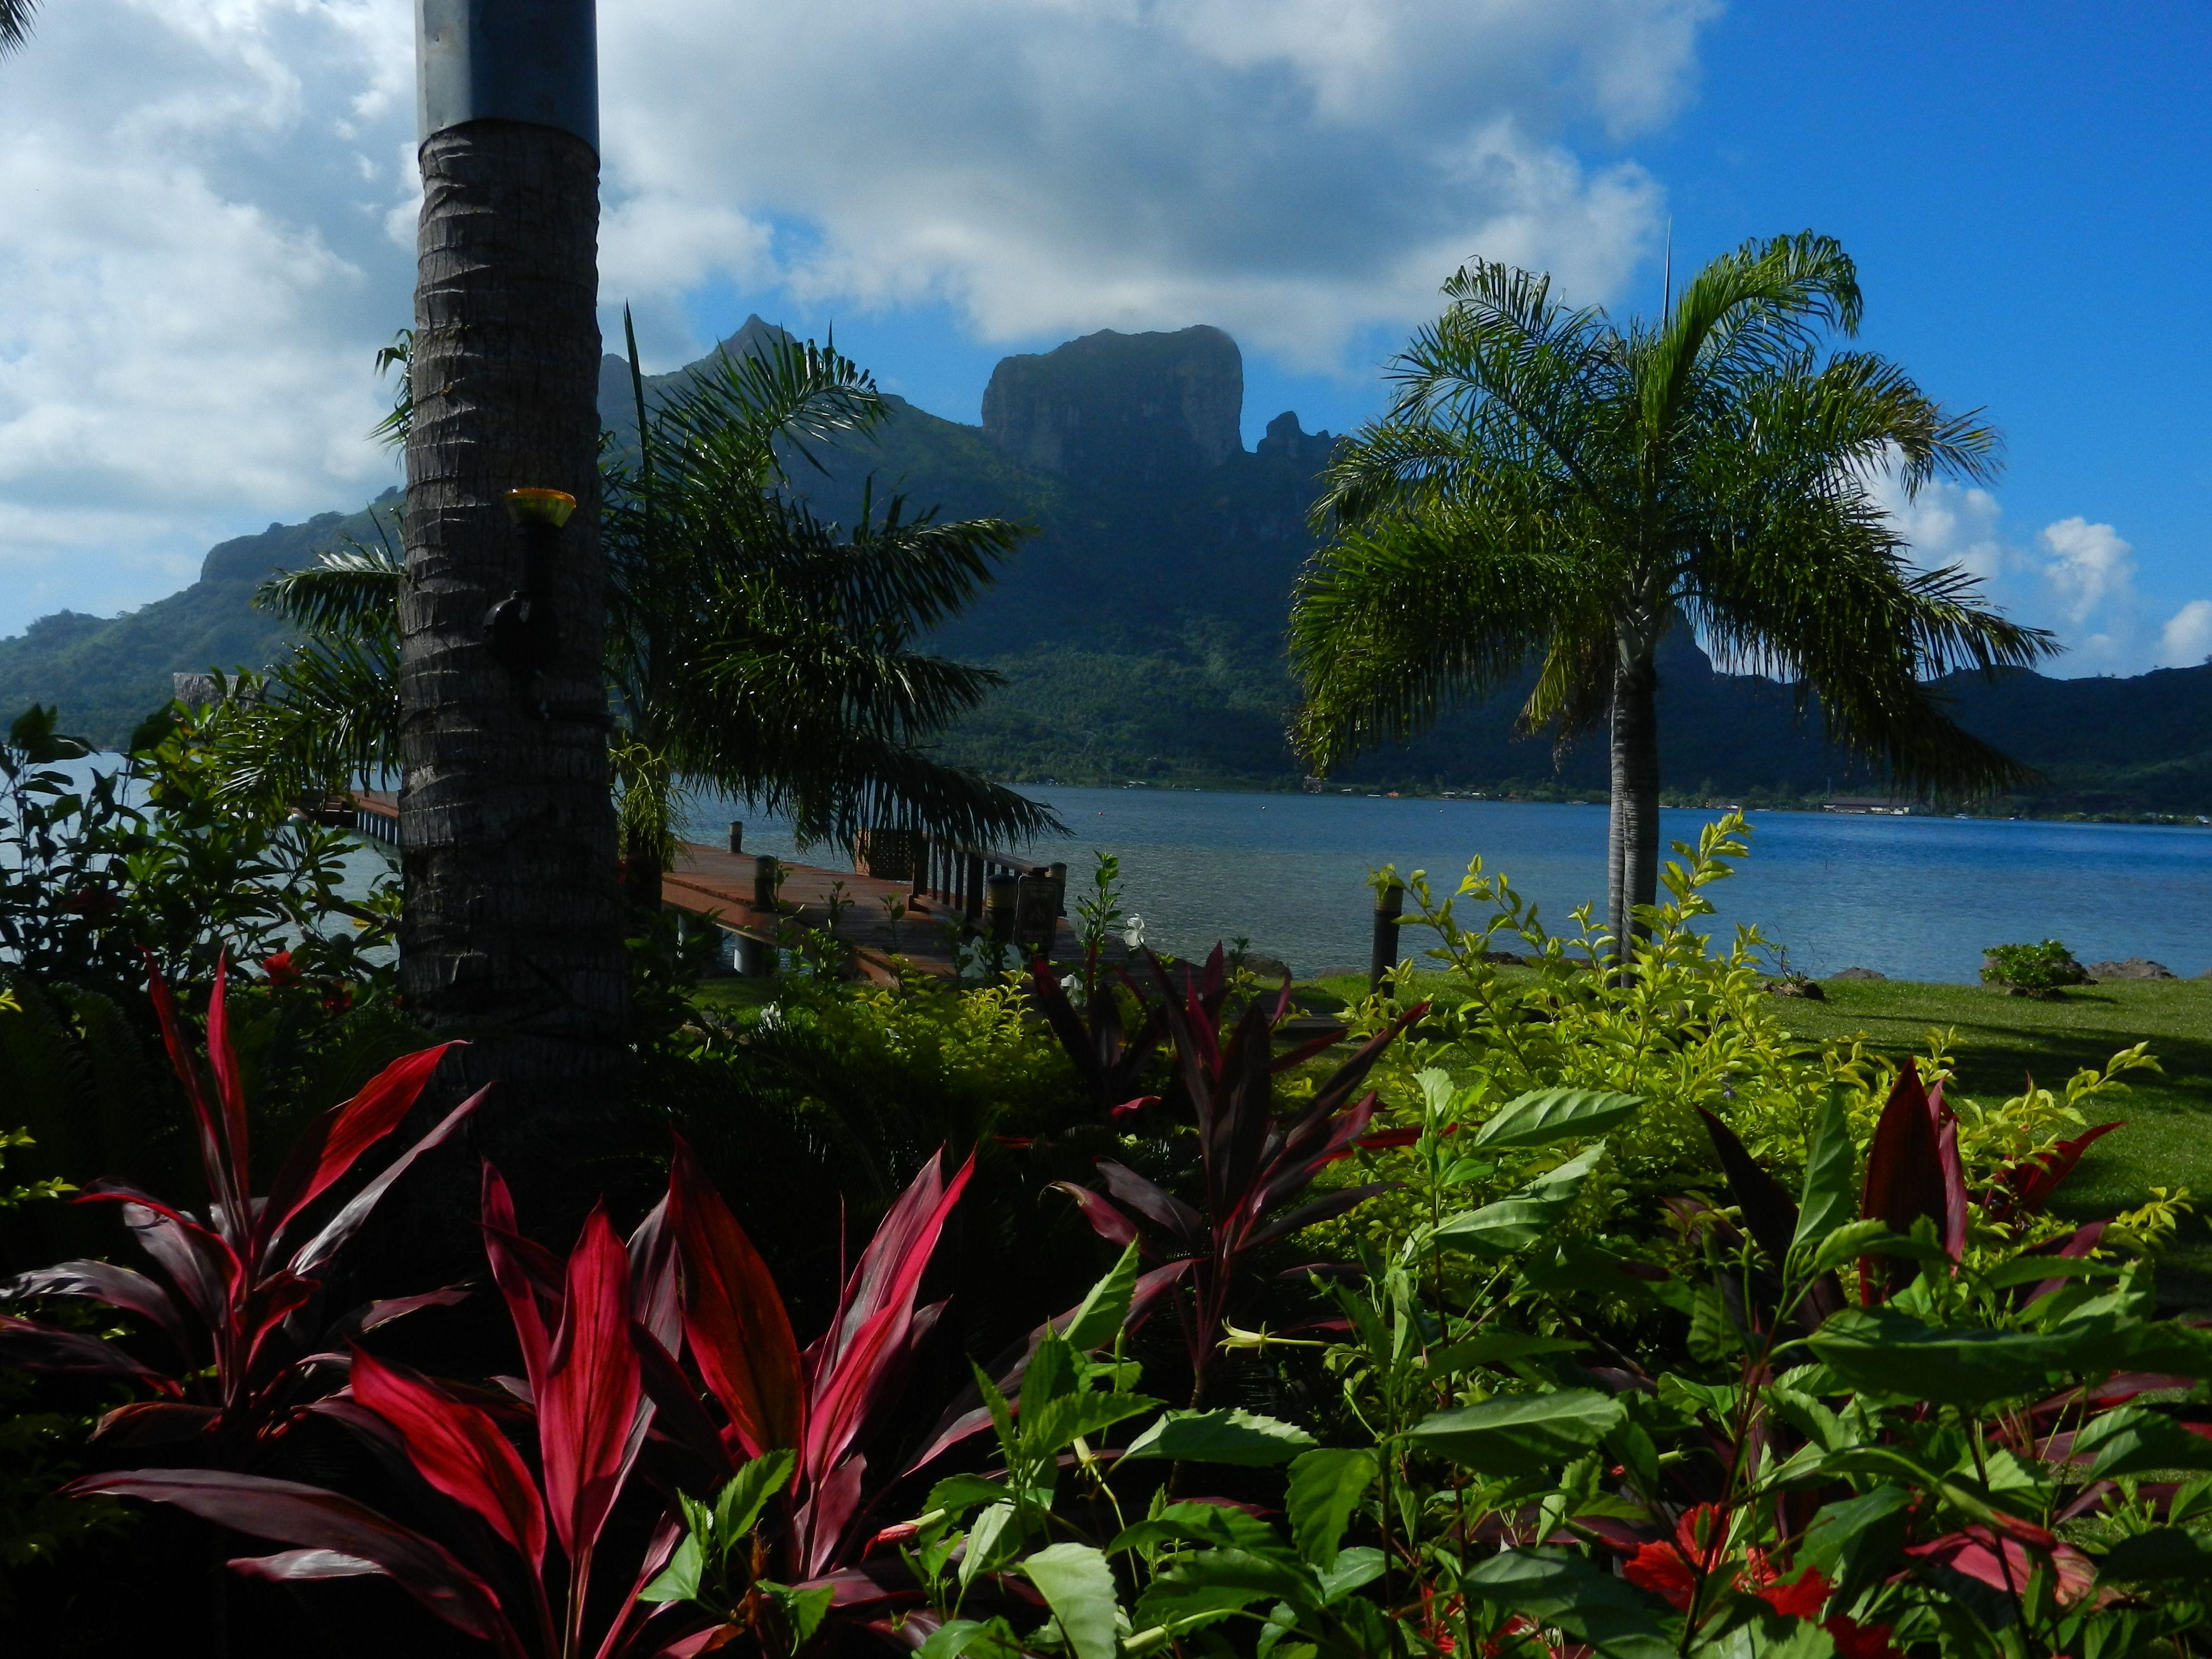 photos don't even show the vibrant beauty of Bora Bora